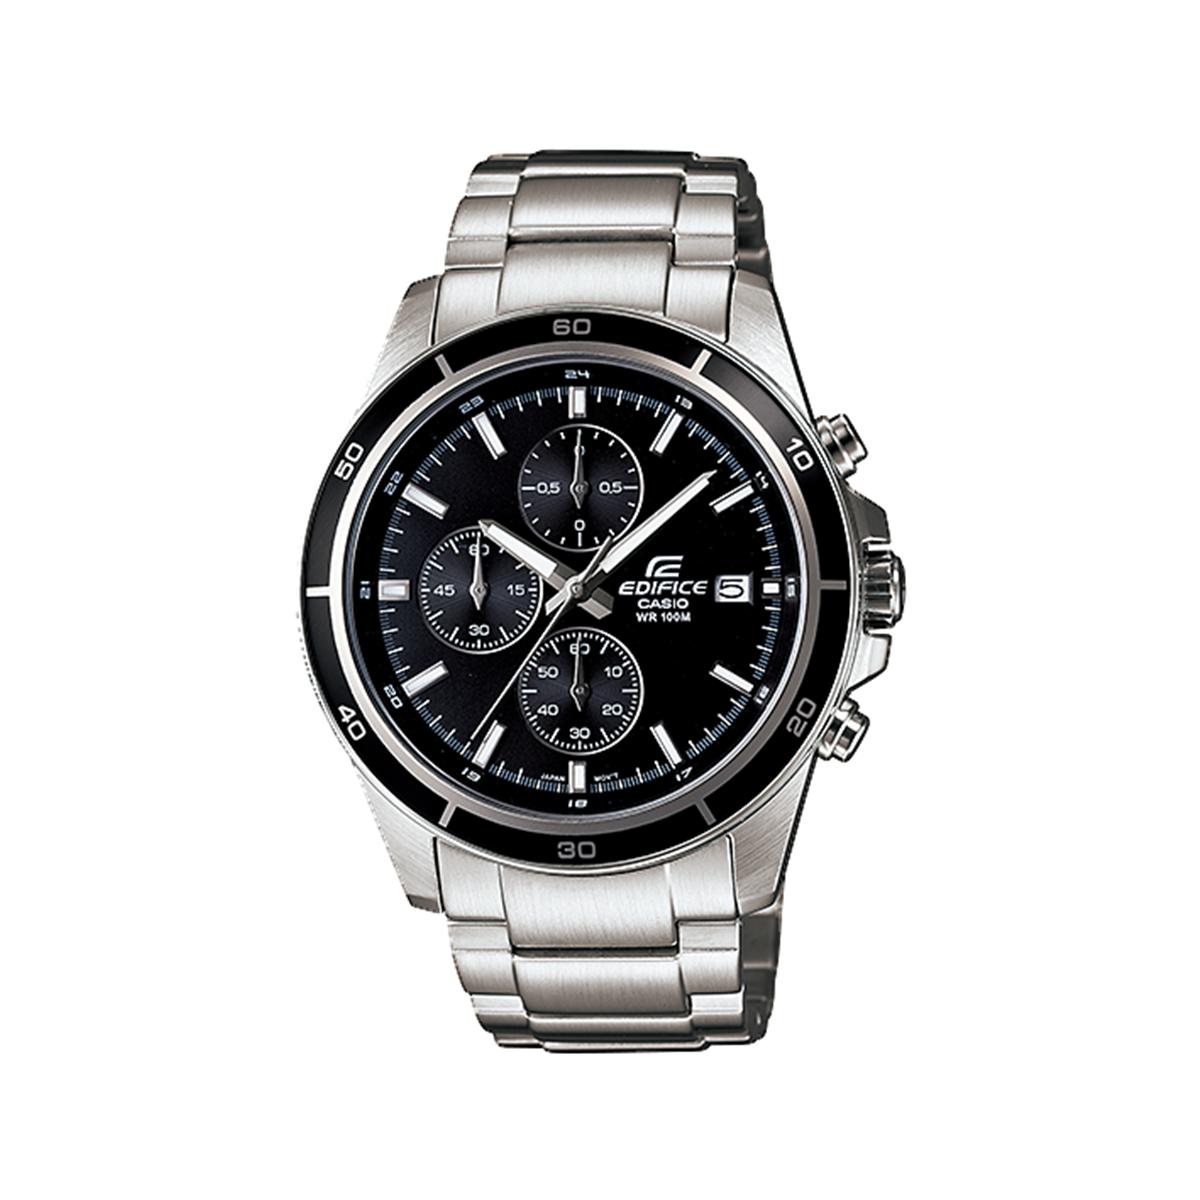 https://www.gaberjoyeria.com/4922-thickbox_default/reloj-casio-edifice.jpg